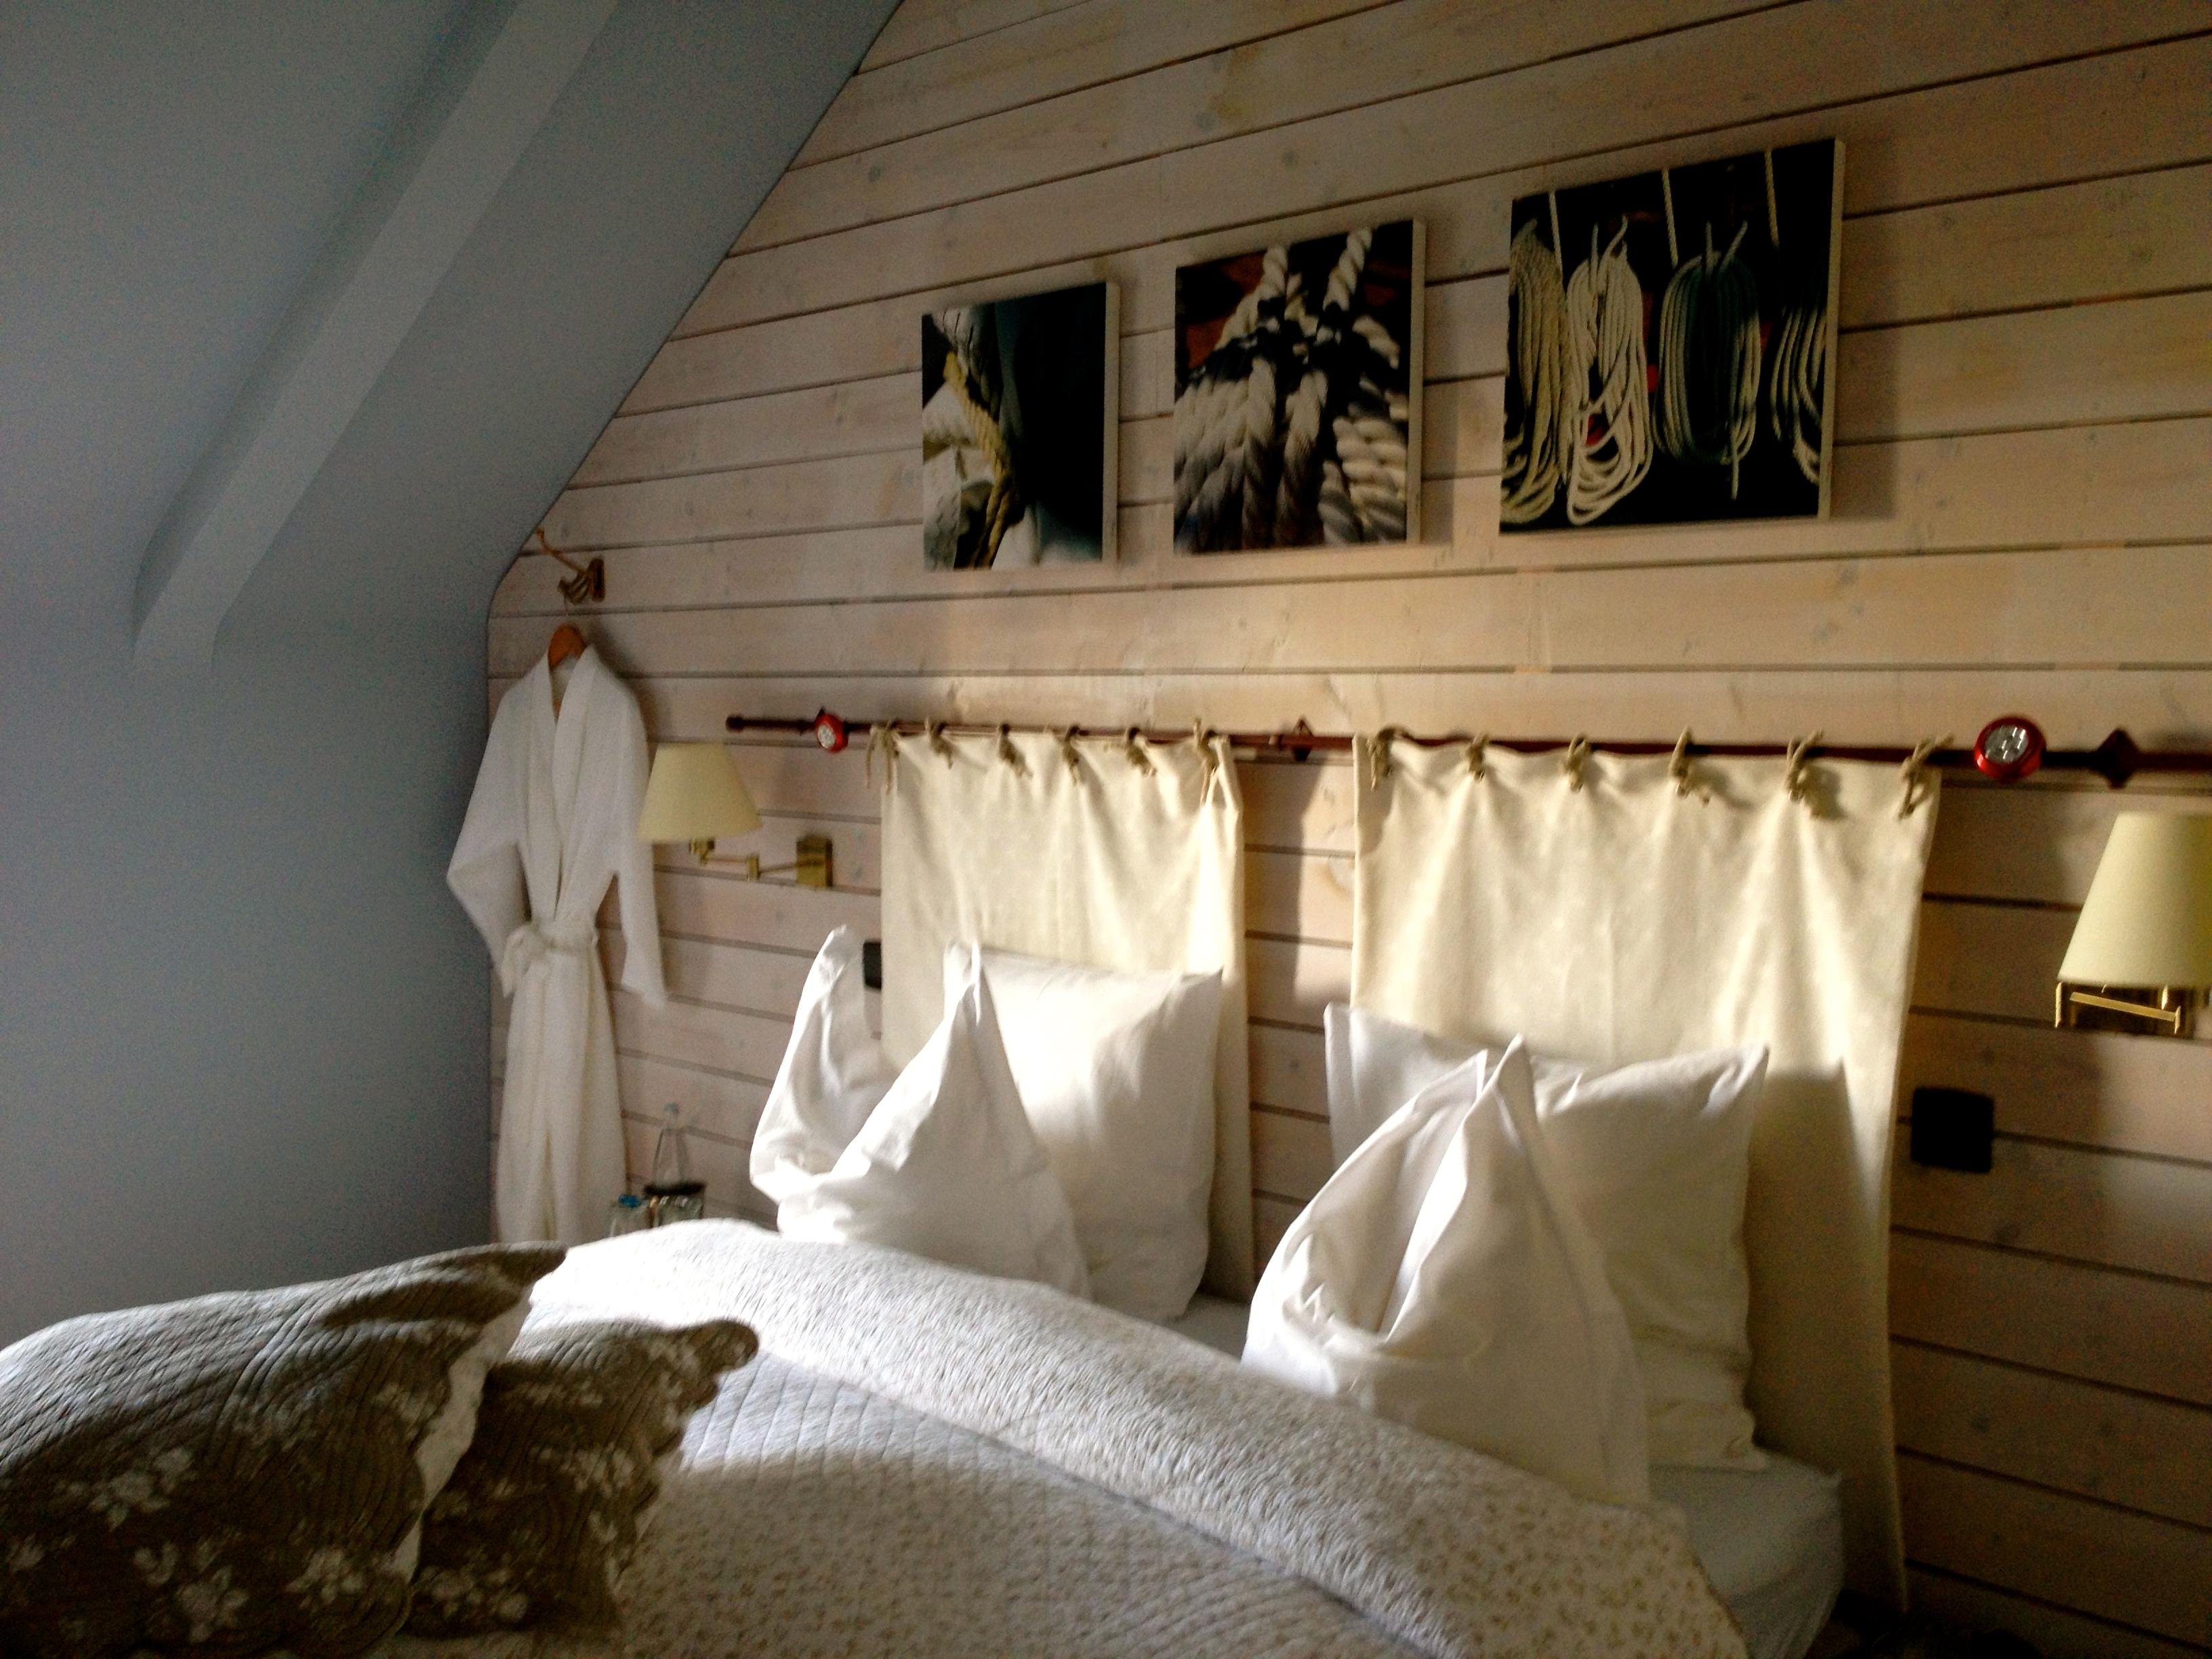 Witte kamer vrij dit week end la maison blanche aux volets bleus 39 blog - Witte kamer en fushia ...